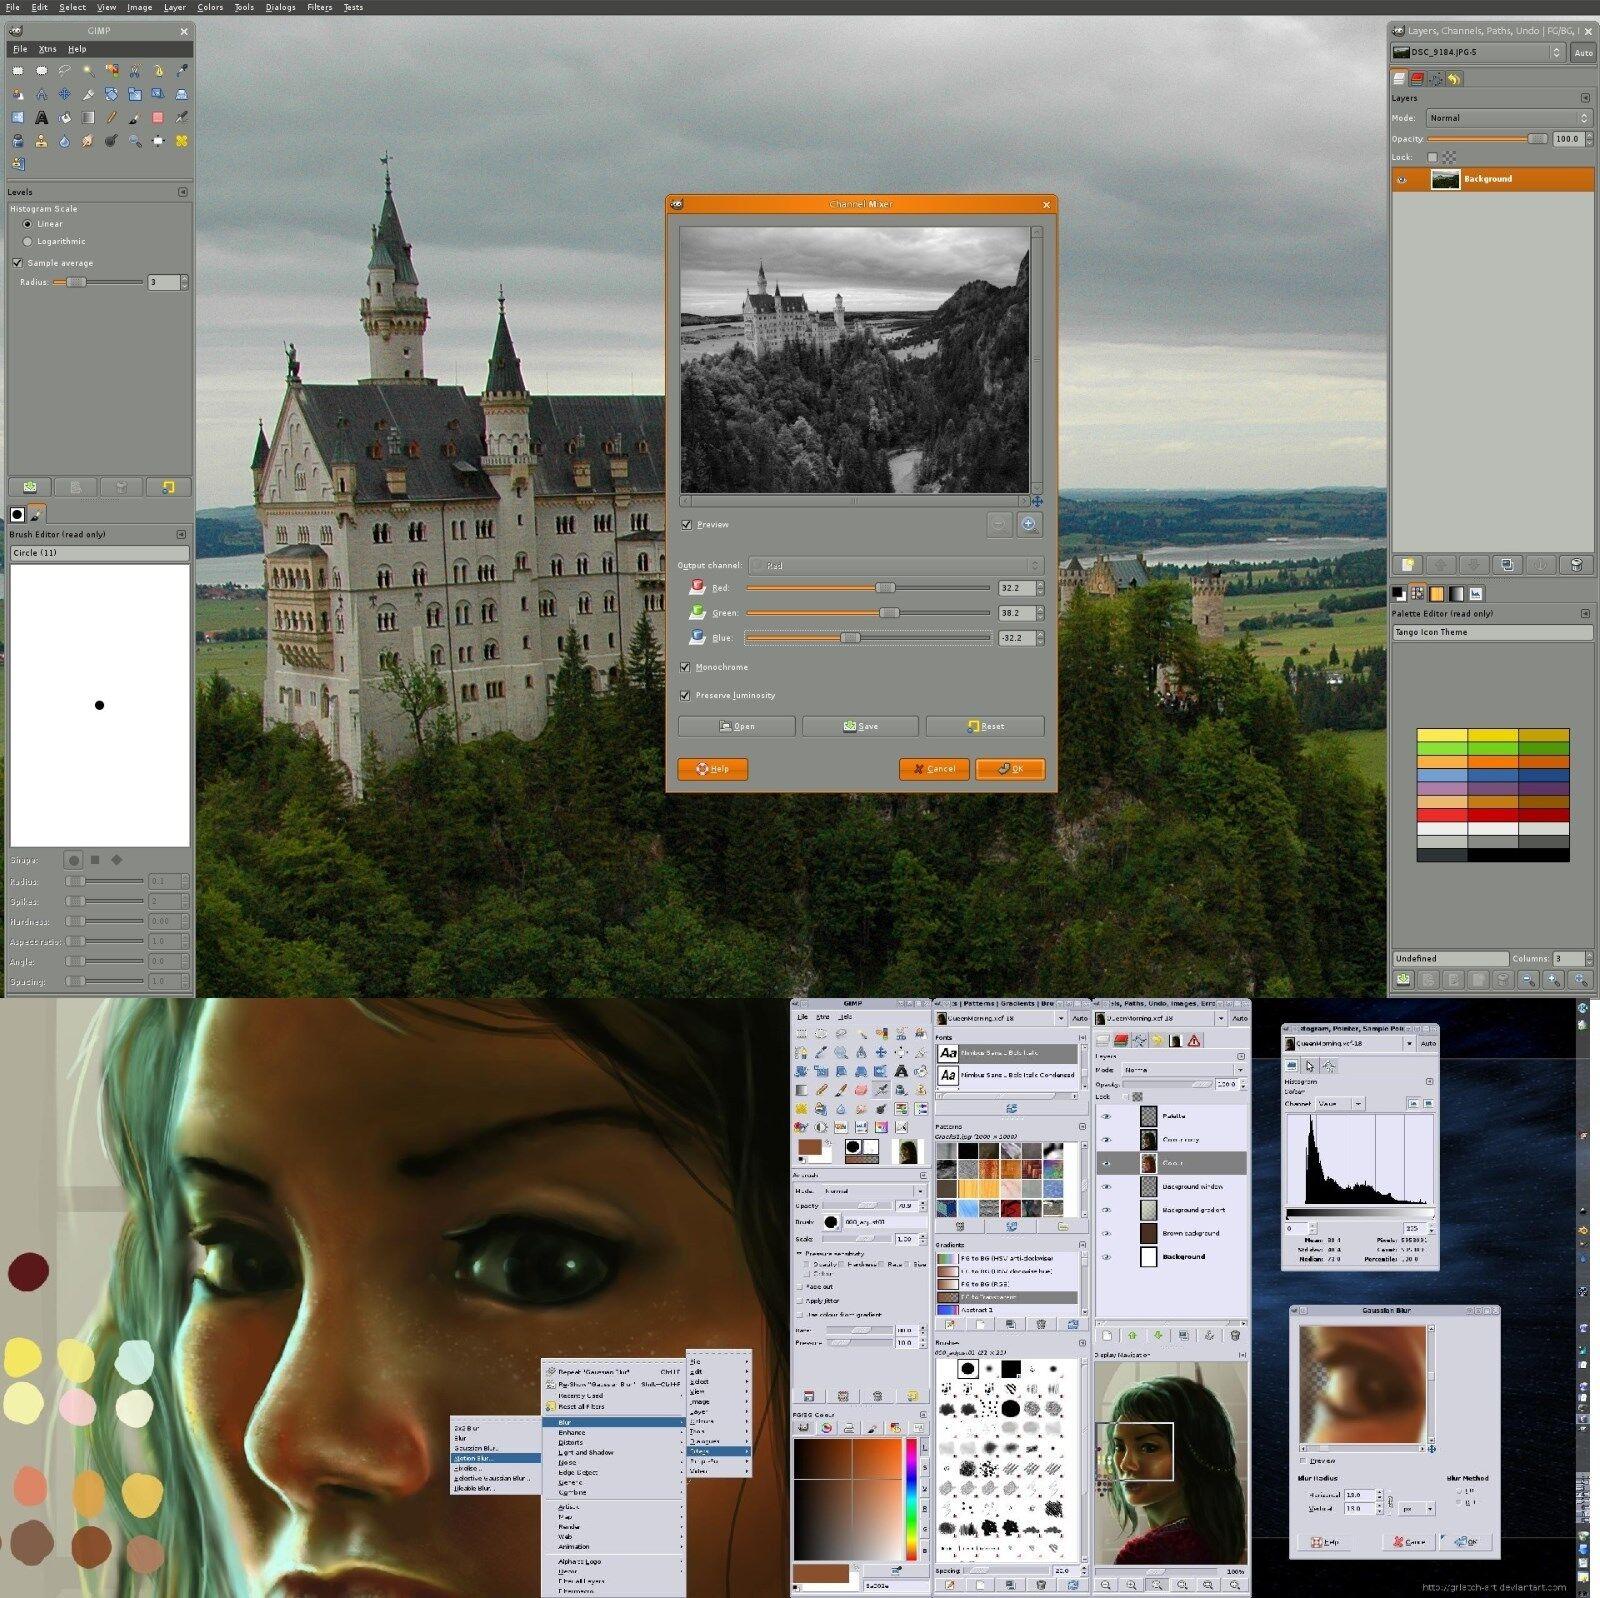 Canon photo editing software windows 10 20 best Shelties images on Pinterest Sheltie, Animais and Animales